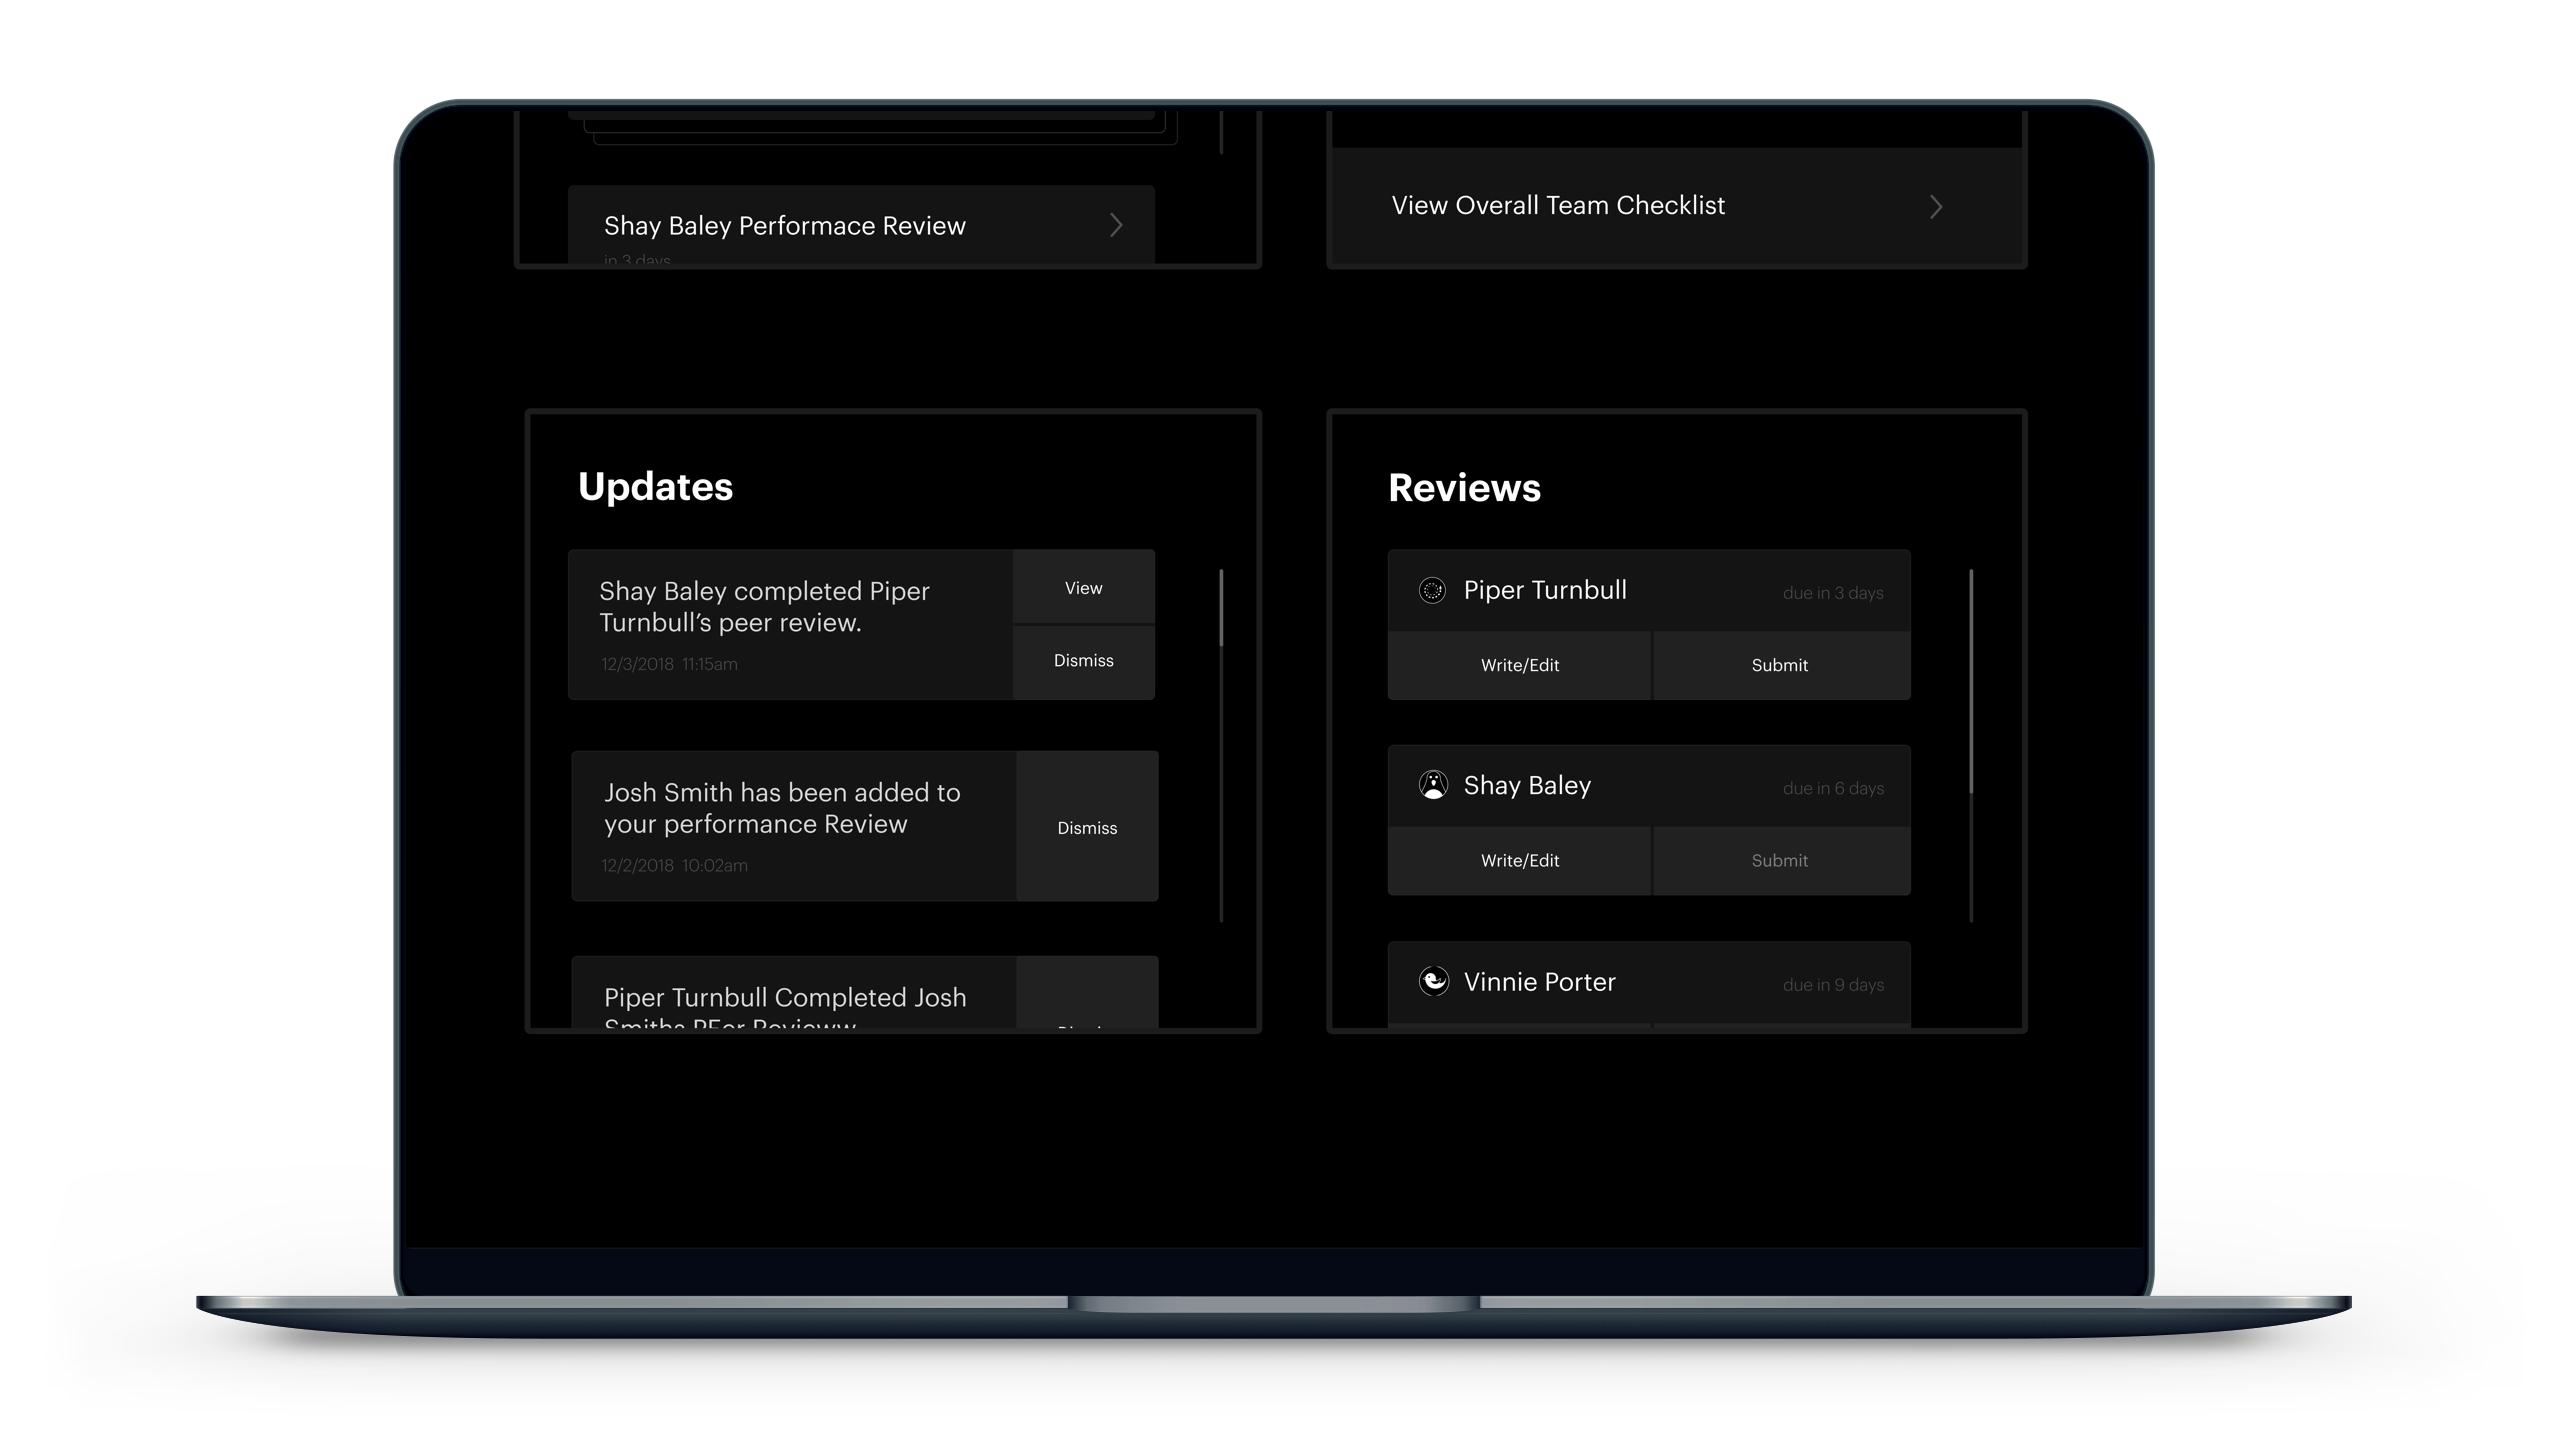 Instrument Updates & Reviews